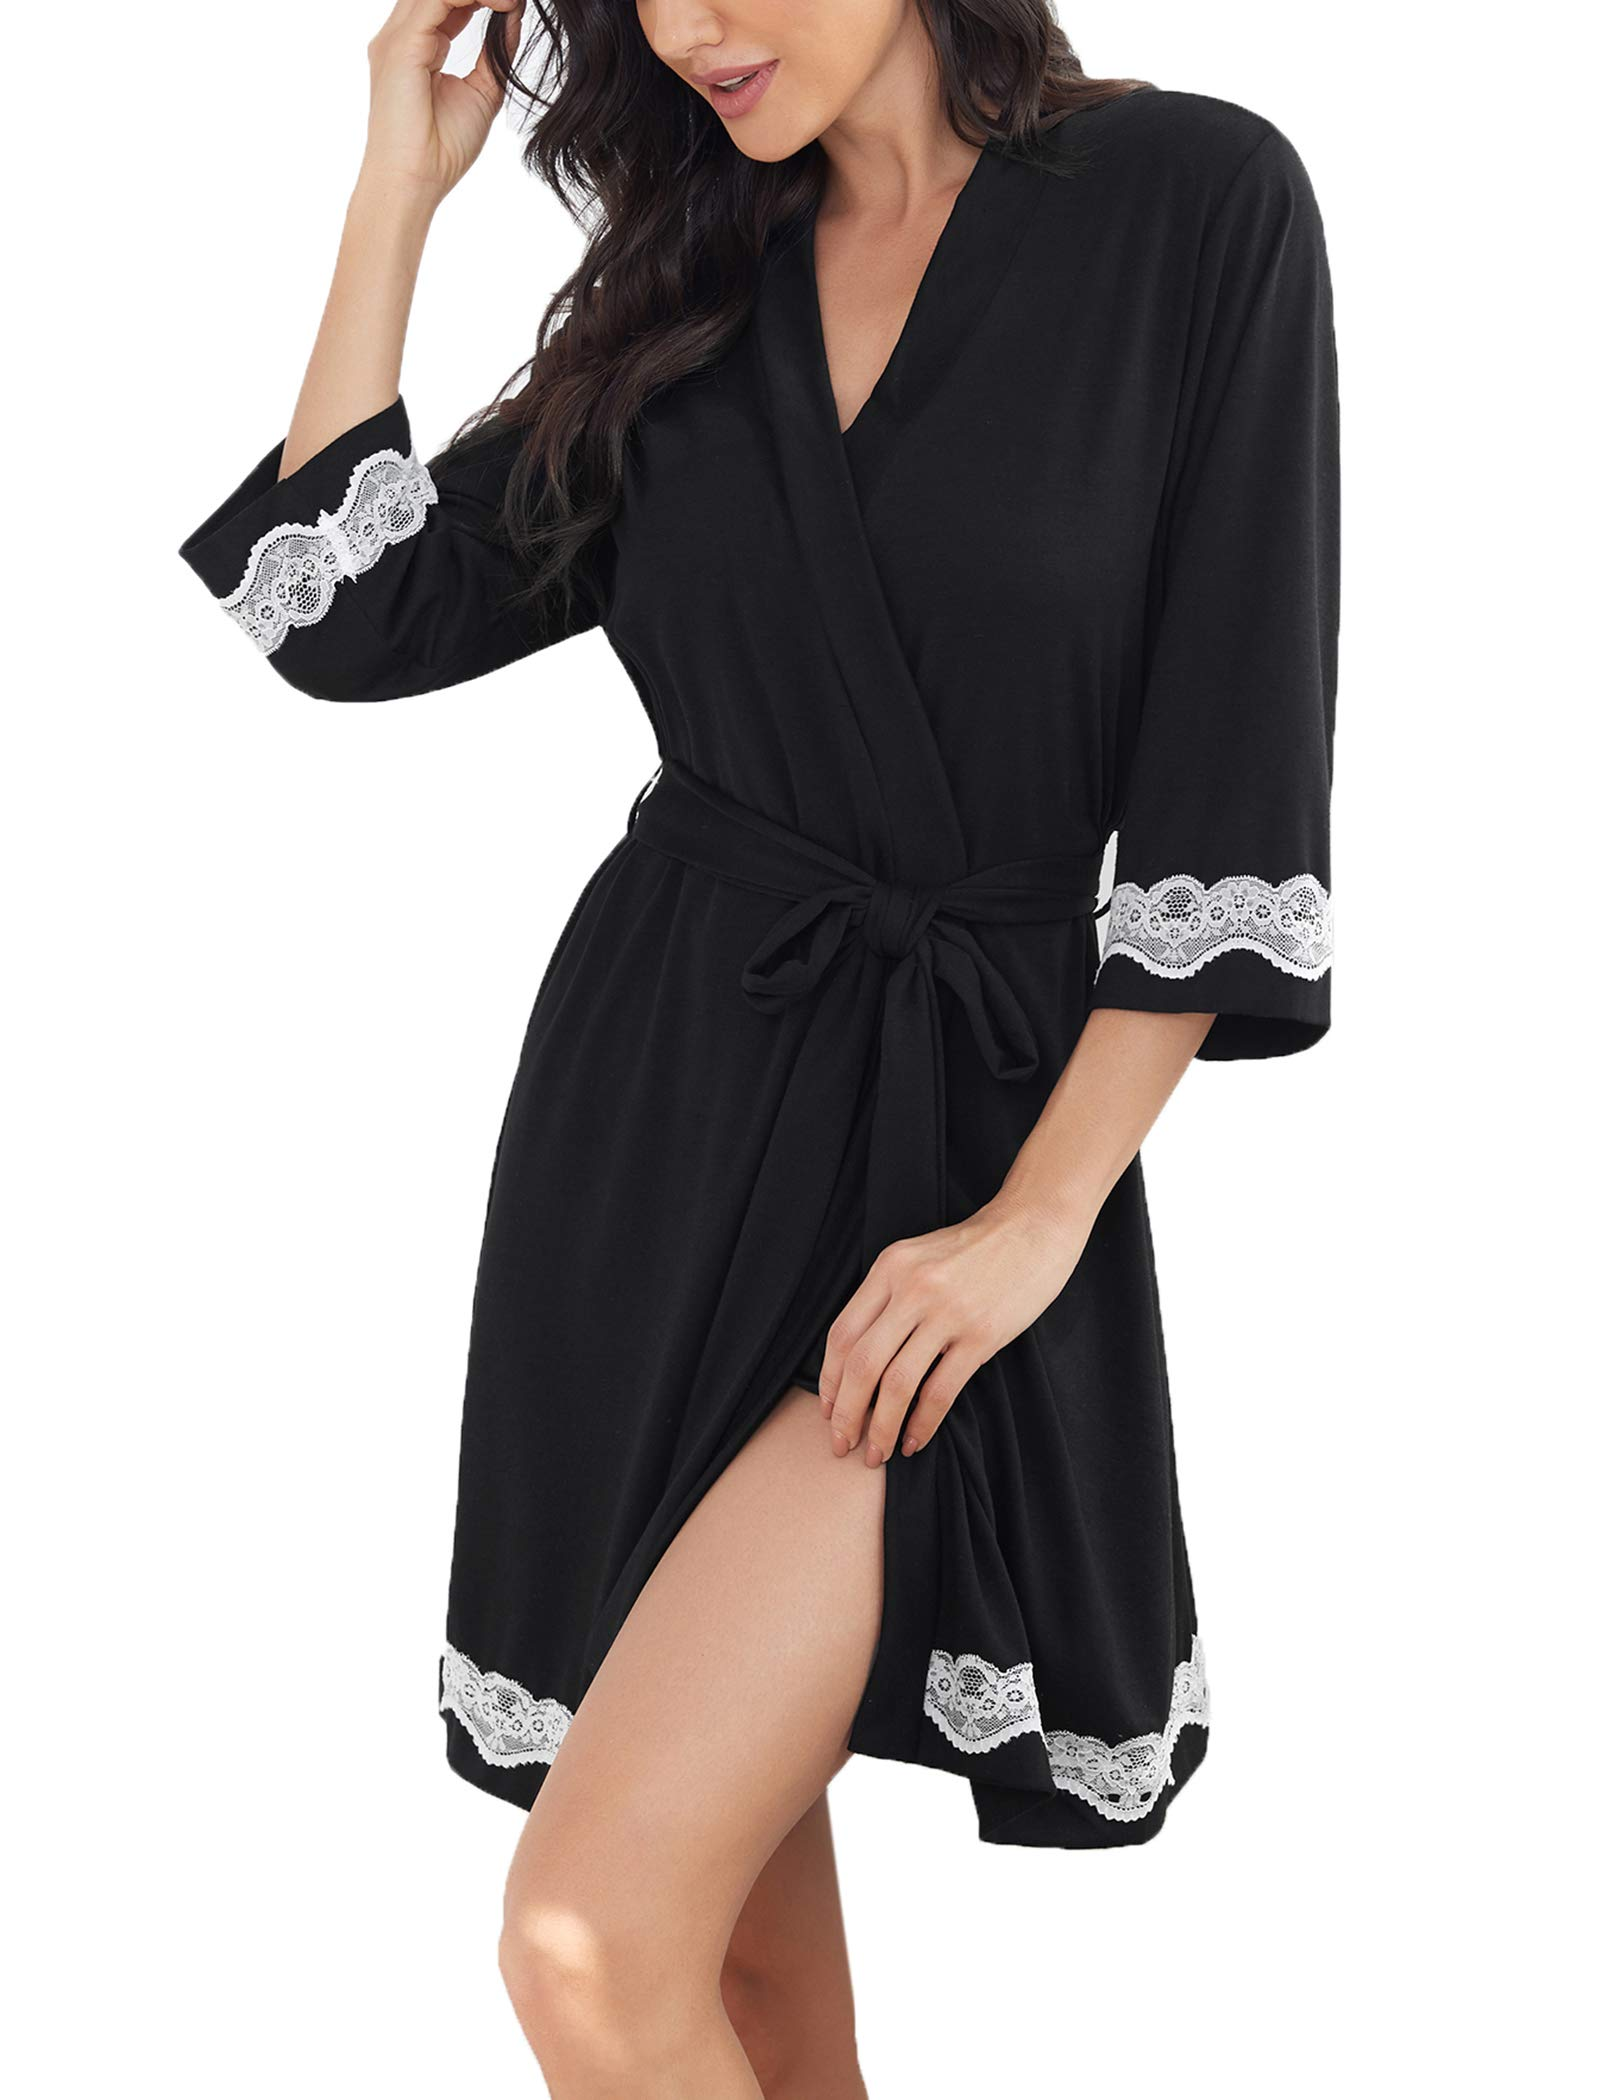 Ekouaer Robes for Women Lace Kimono Robes Short Bathrobe with 3/4 Sleeve Soft Sleepwear Ladies Loungewear S-XXL